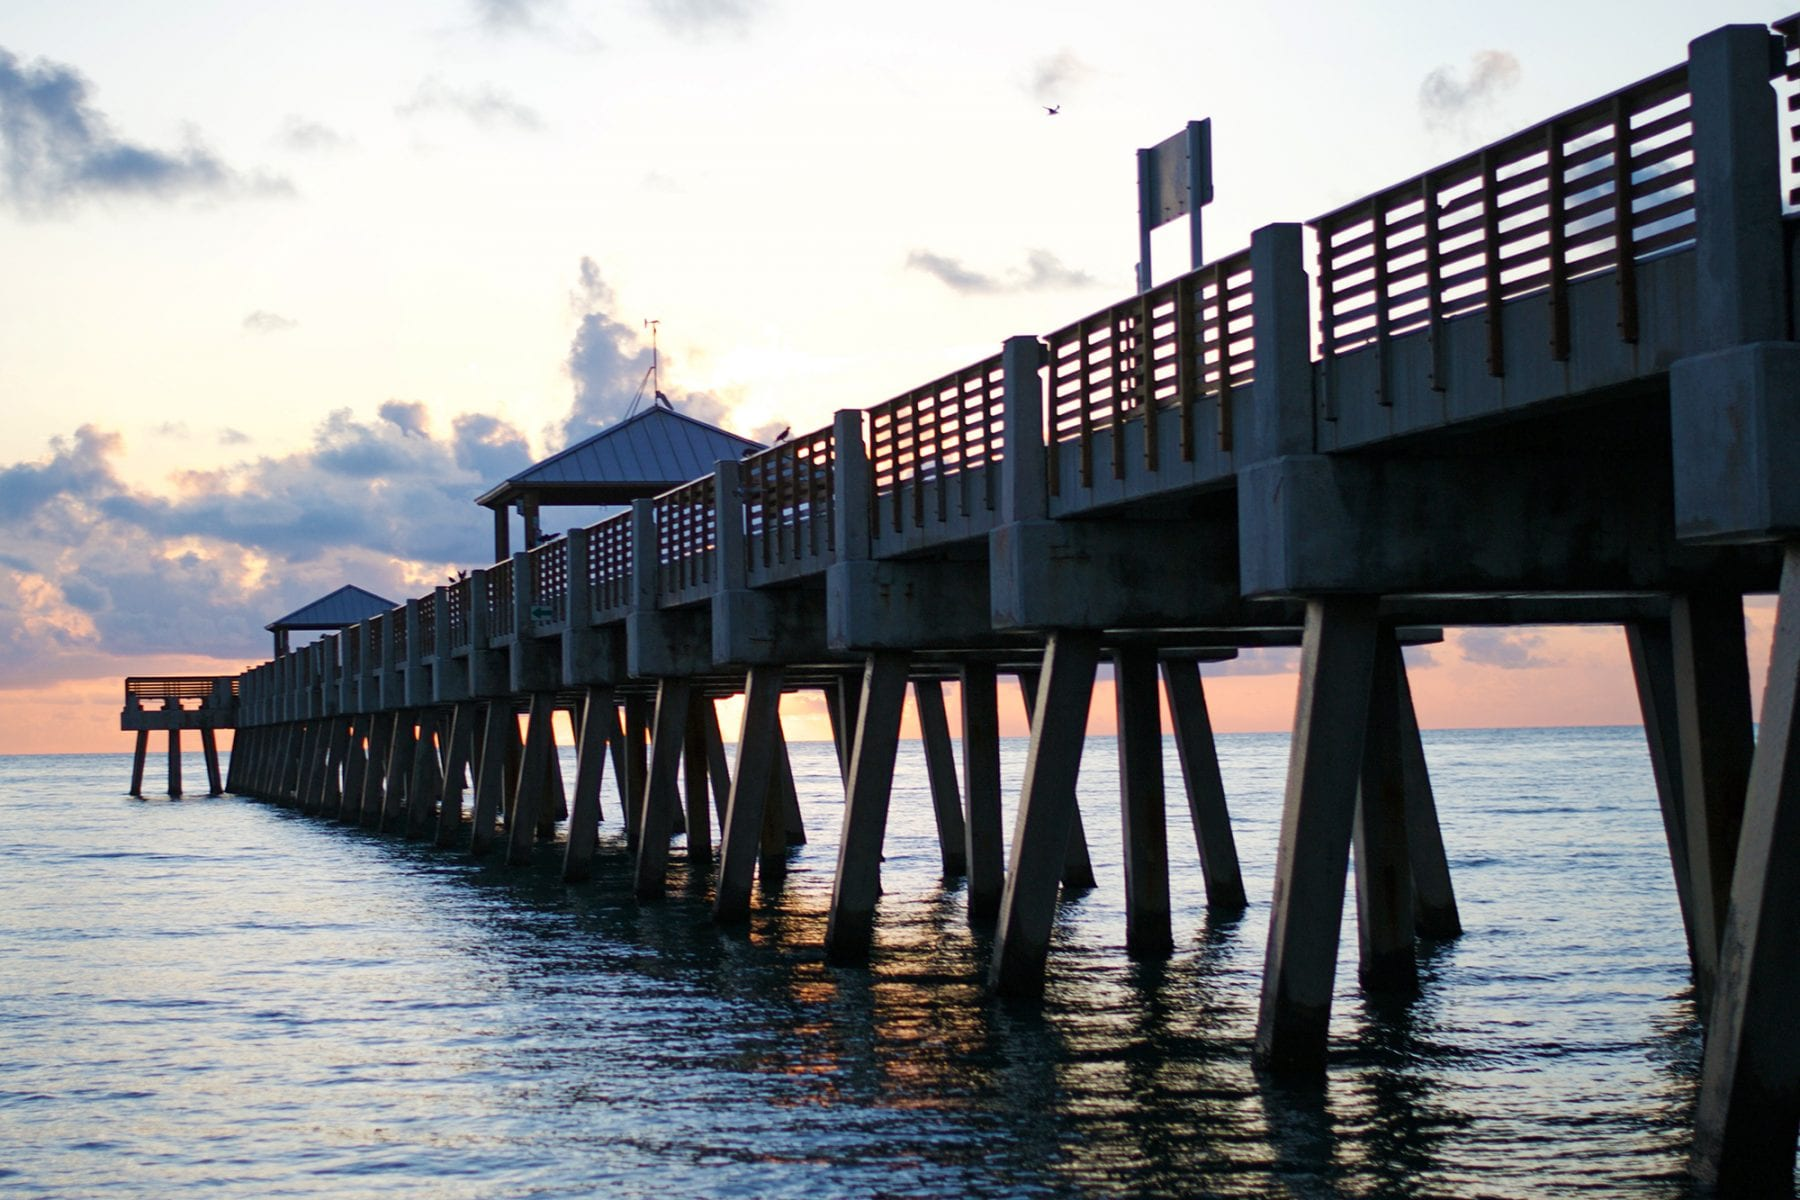 Juno beach pier fishing forecast february 2018 coastal for Juno pier fishing report